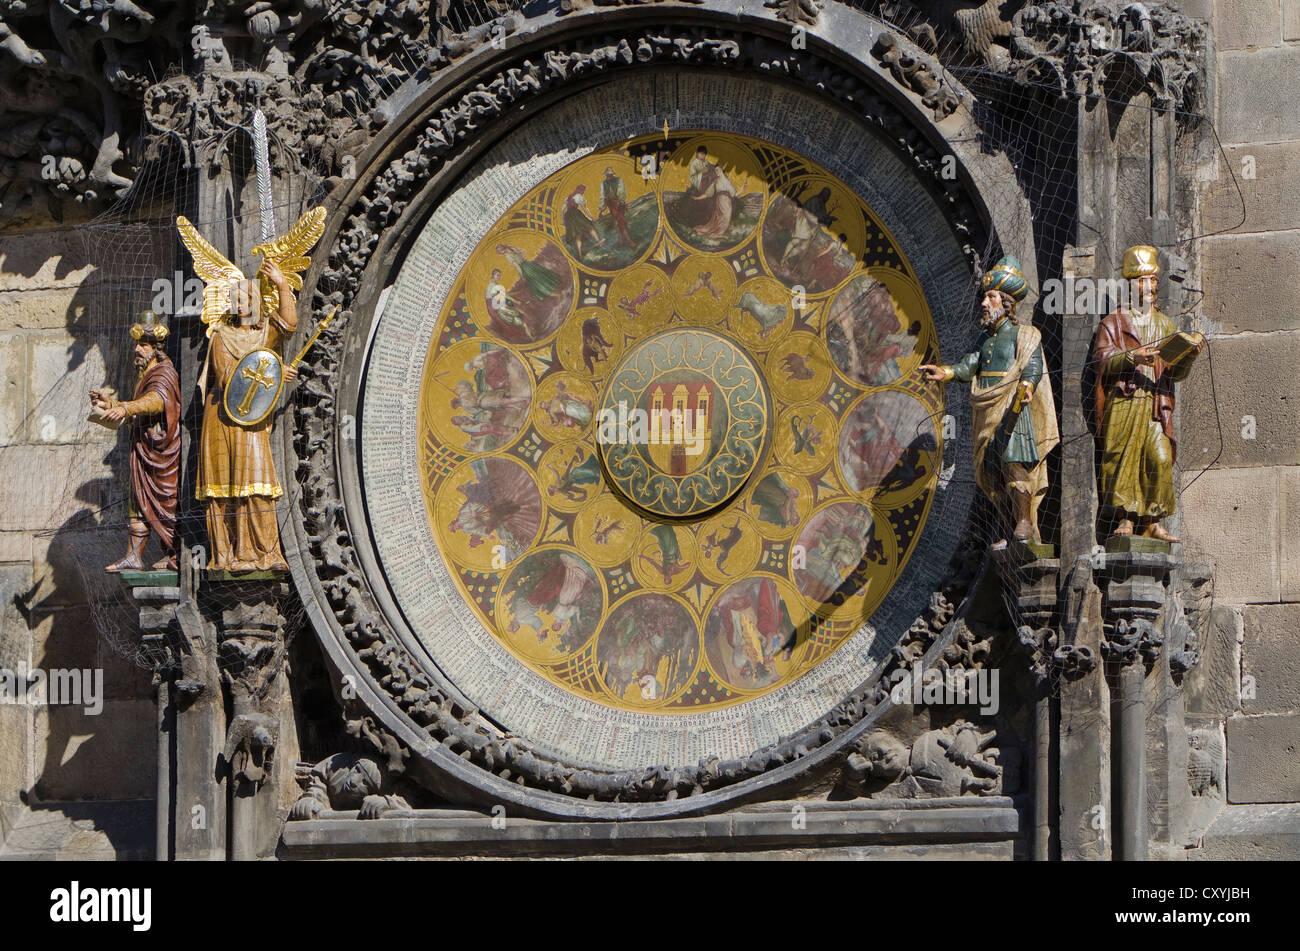 Prazsky orloj, the astronomical clock of Prague's town hall, built in 1410 by royal clockmaker Mikulas of Kadan, - Stock Image